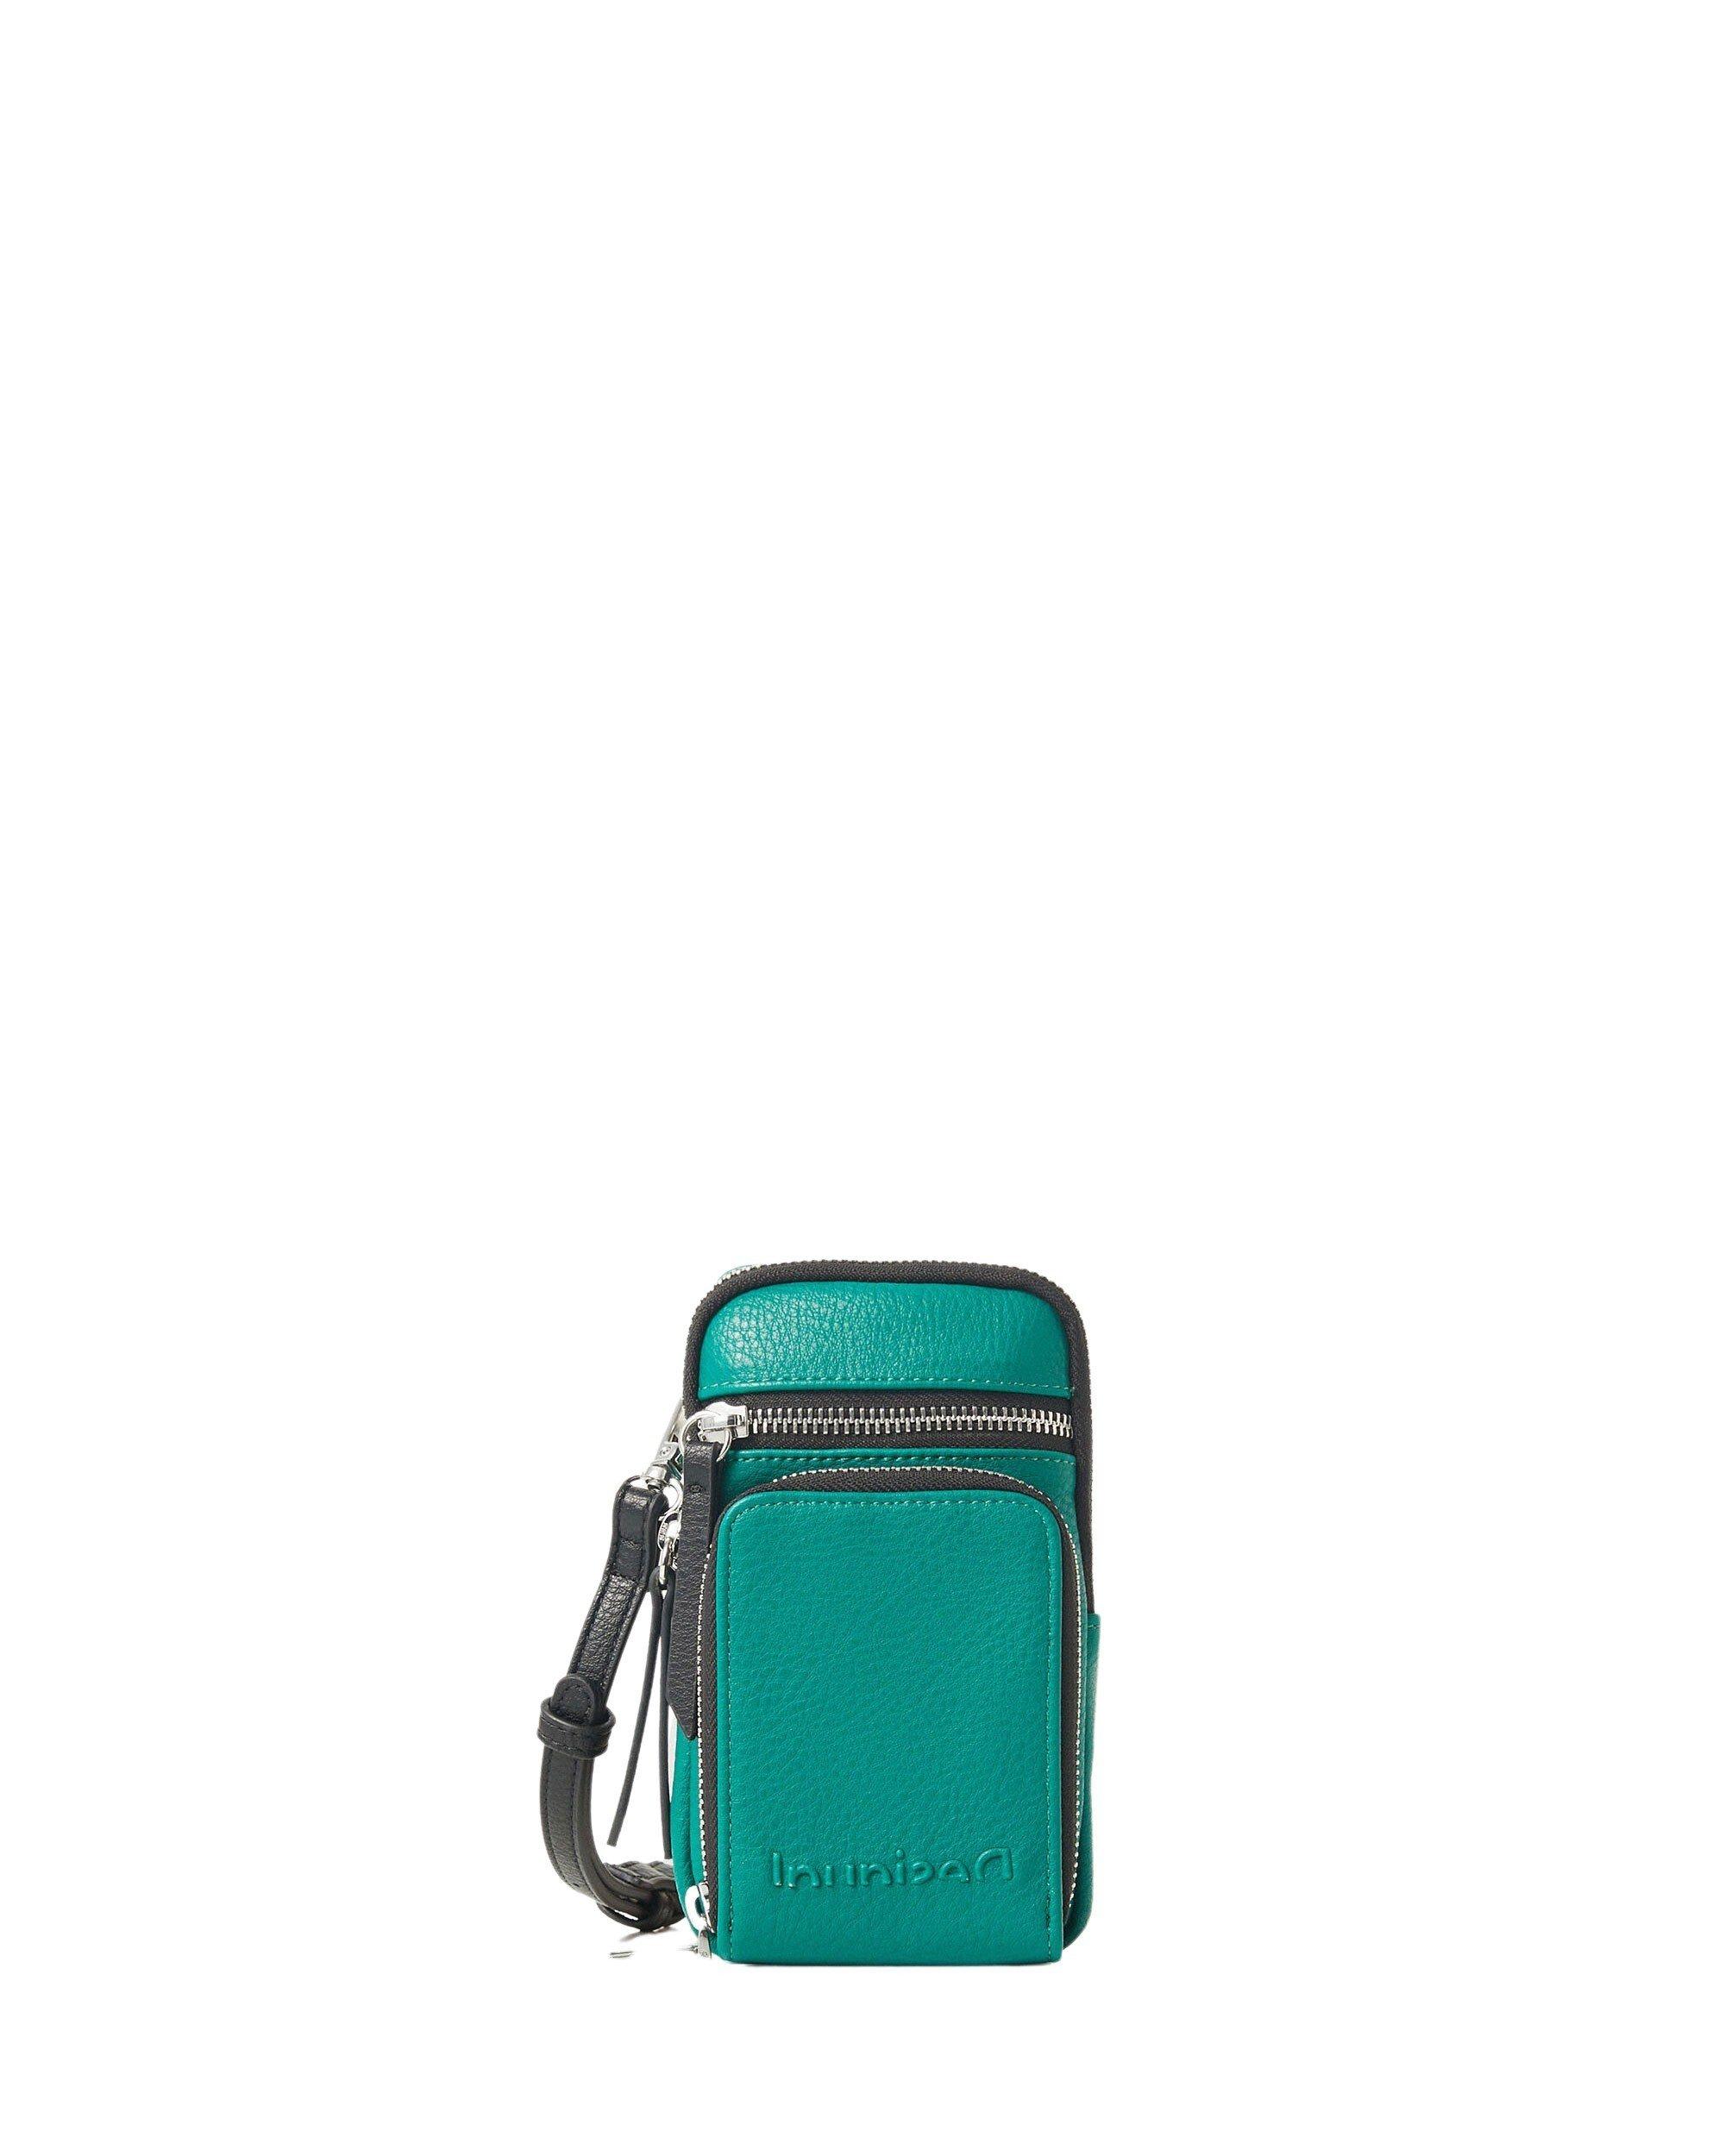 Desigual Women's Bag Black 305781 - green UNICA